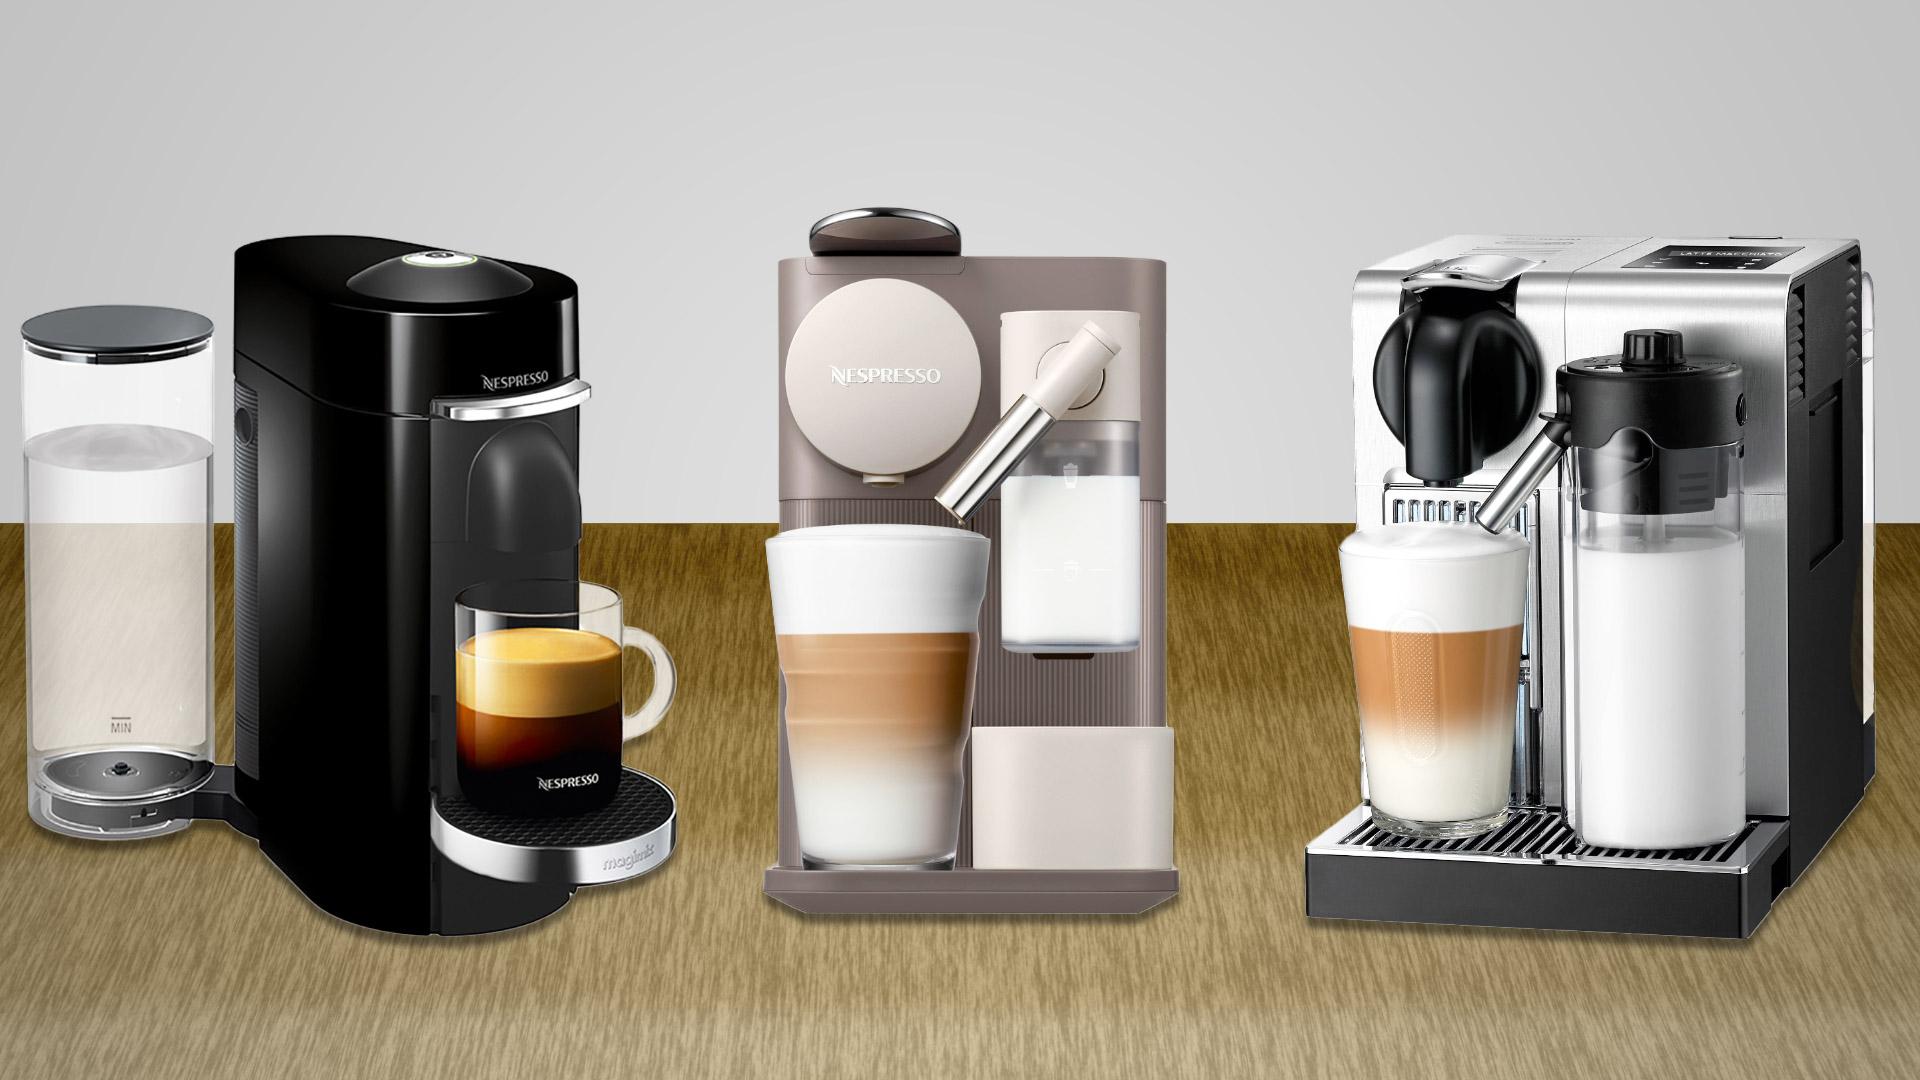 Best Nespresso machine 2020: quality coffee without the mess